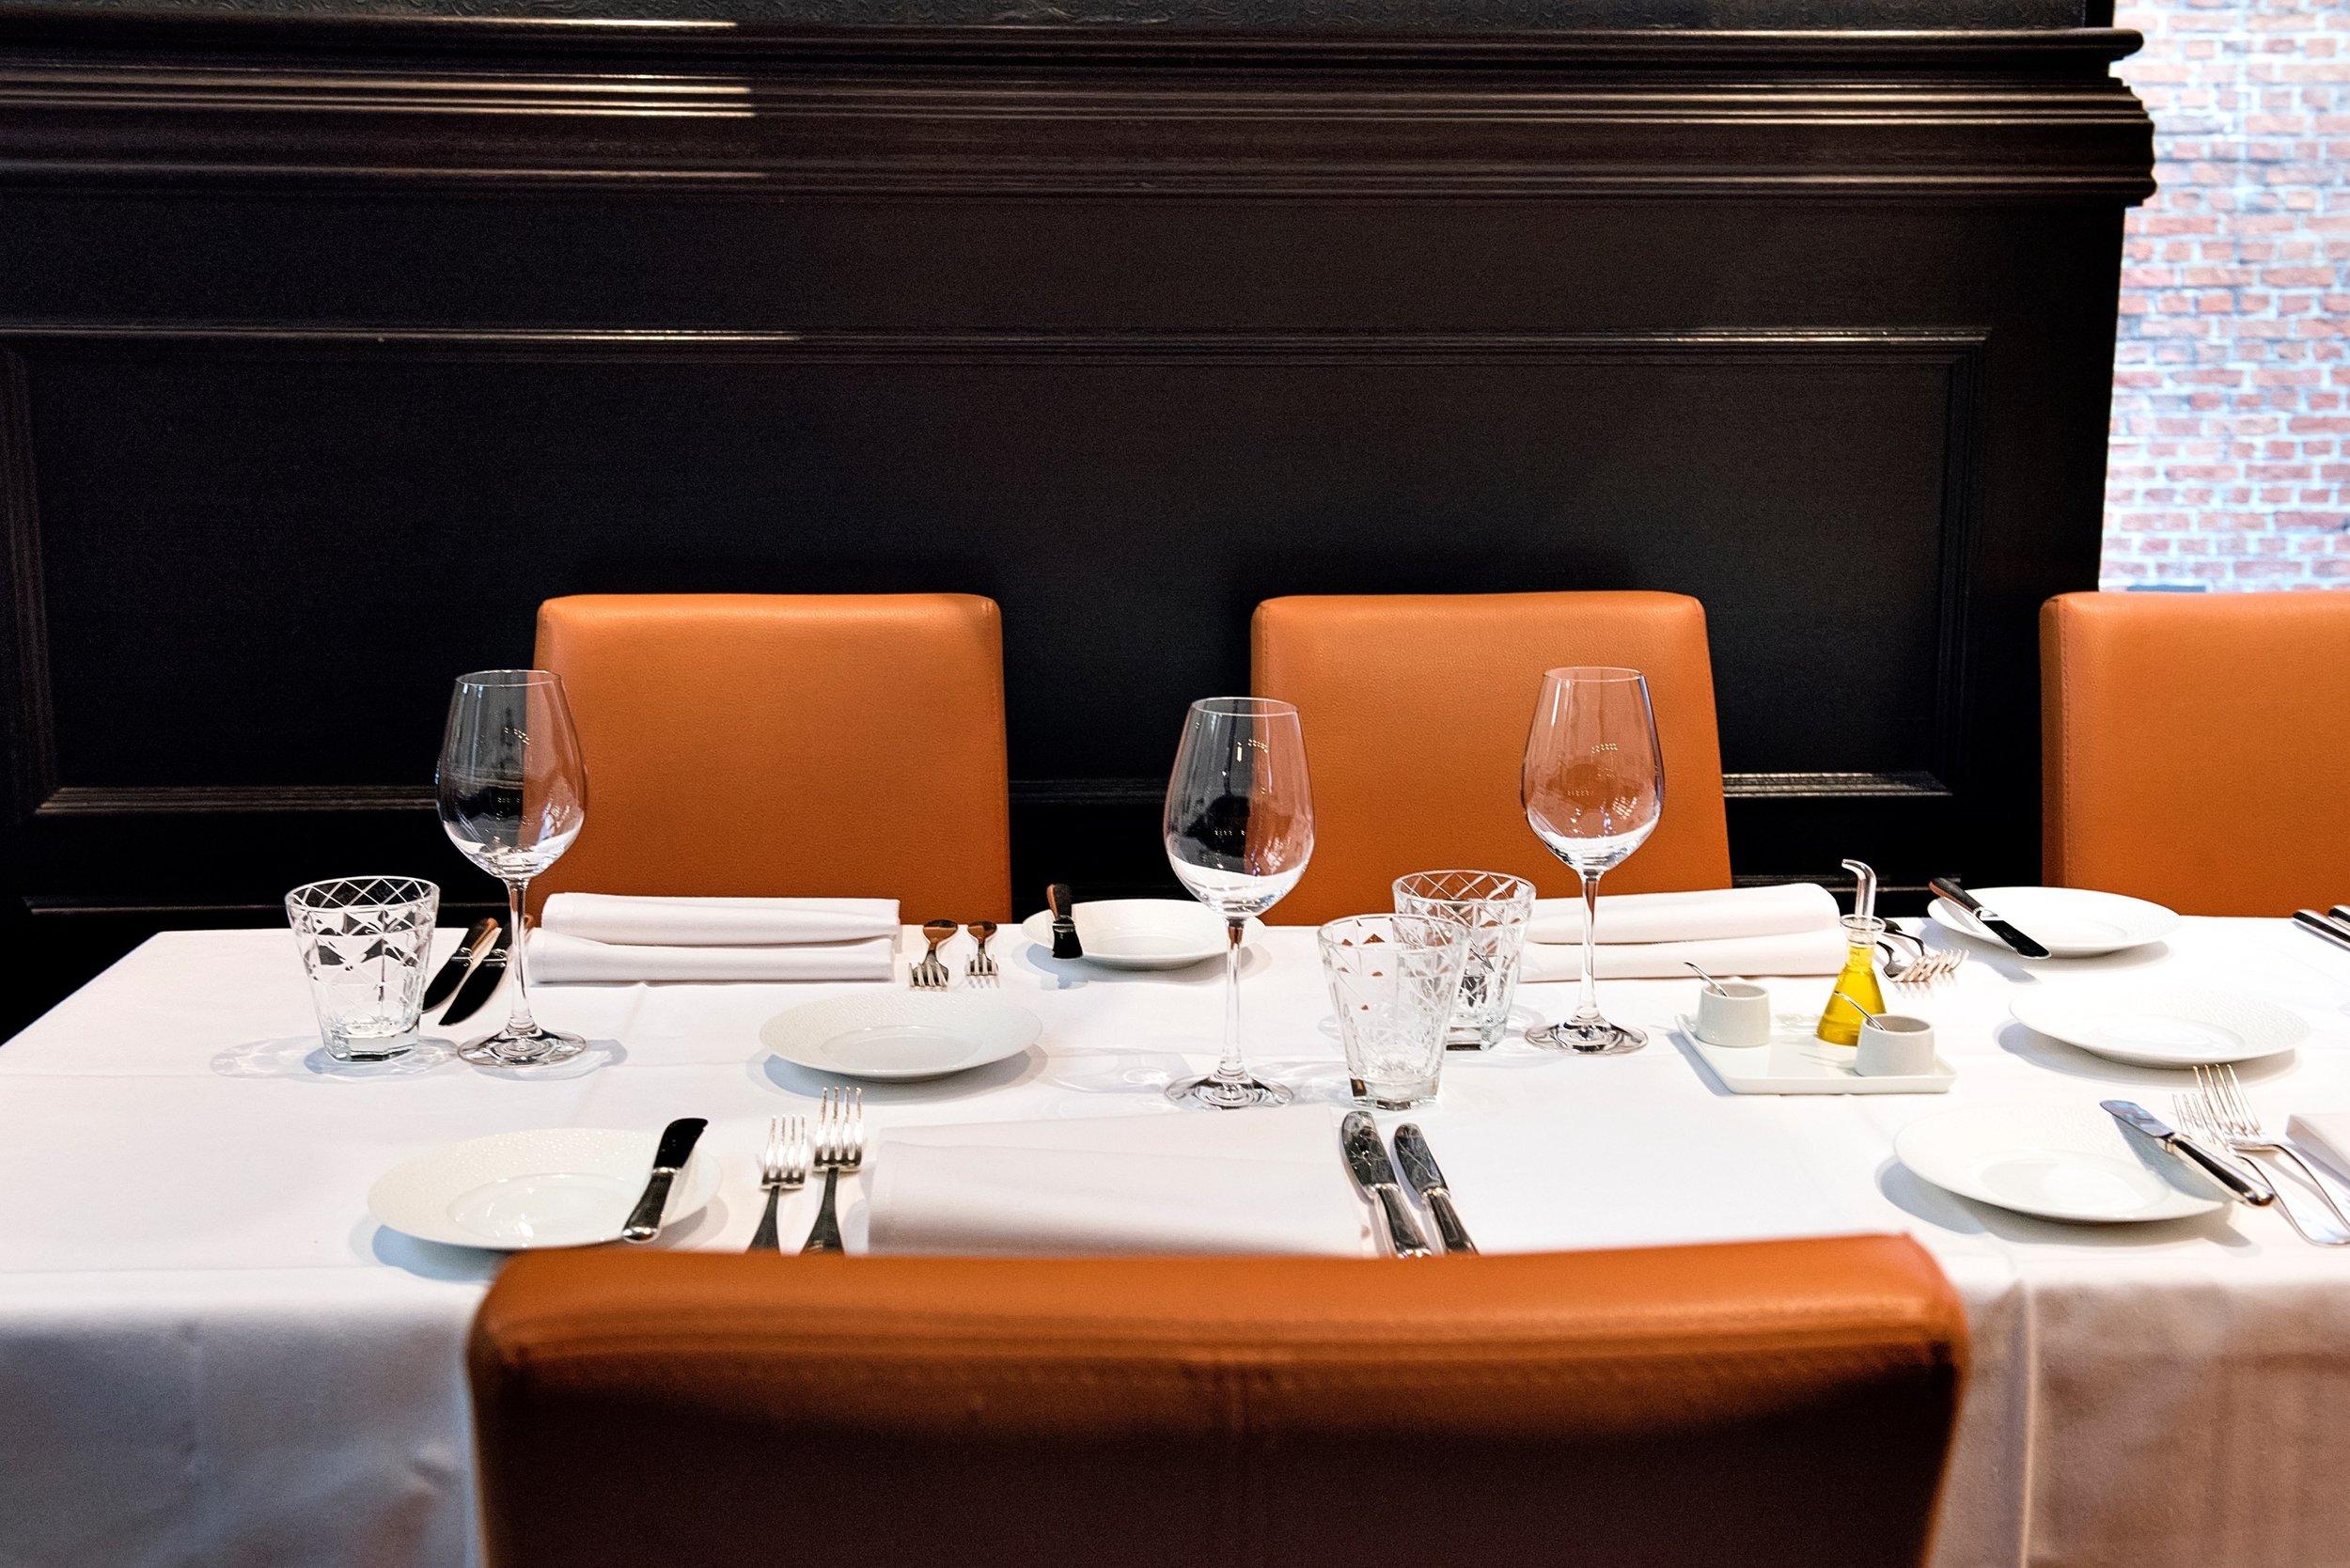 17 michelin restaurant the glorious antwerpen tablefever bart albrecht.jpg